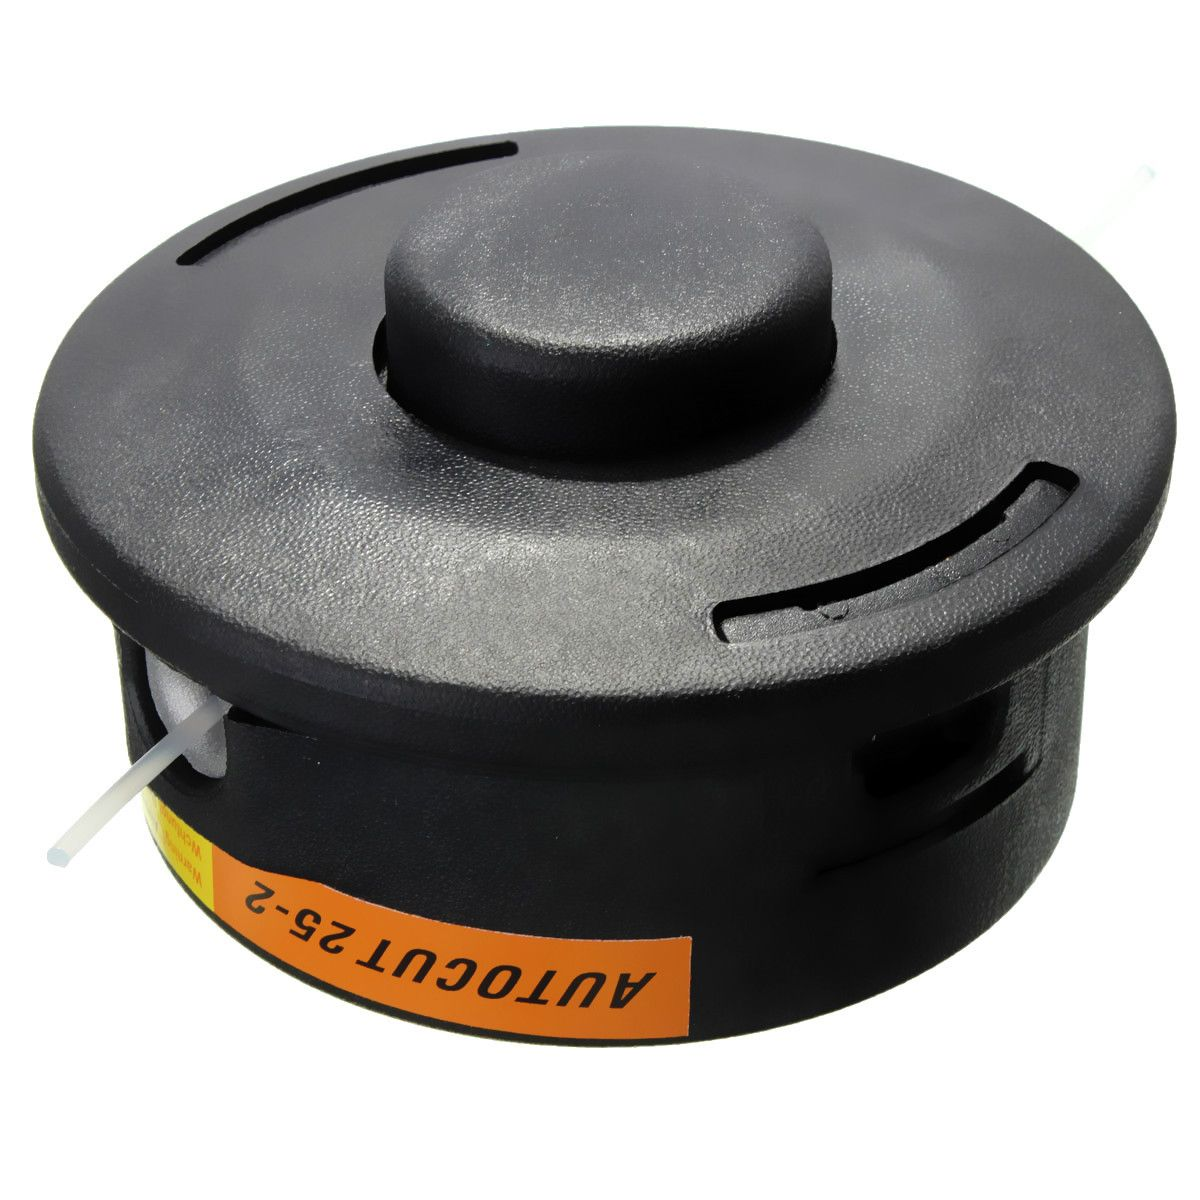 Auto Cut 25-2 Nylon Line Bump Feed Head For Brushcutter STIHL trimmer Black FS120 250